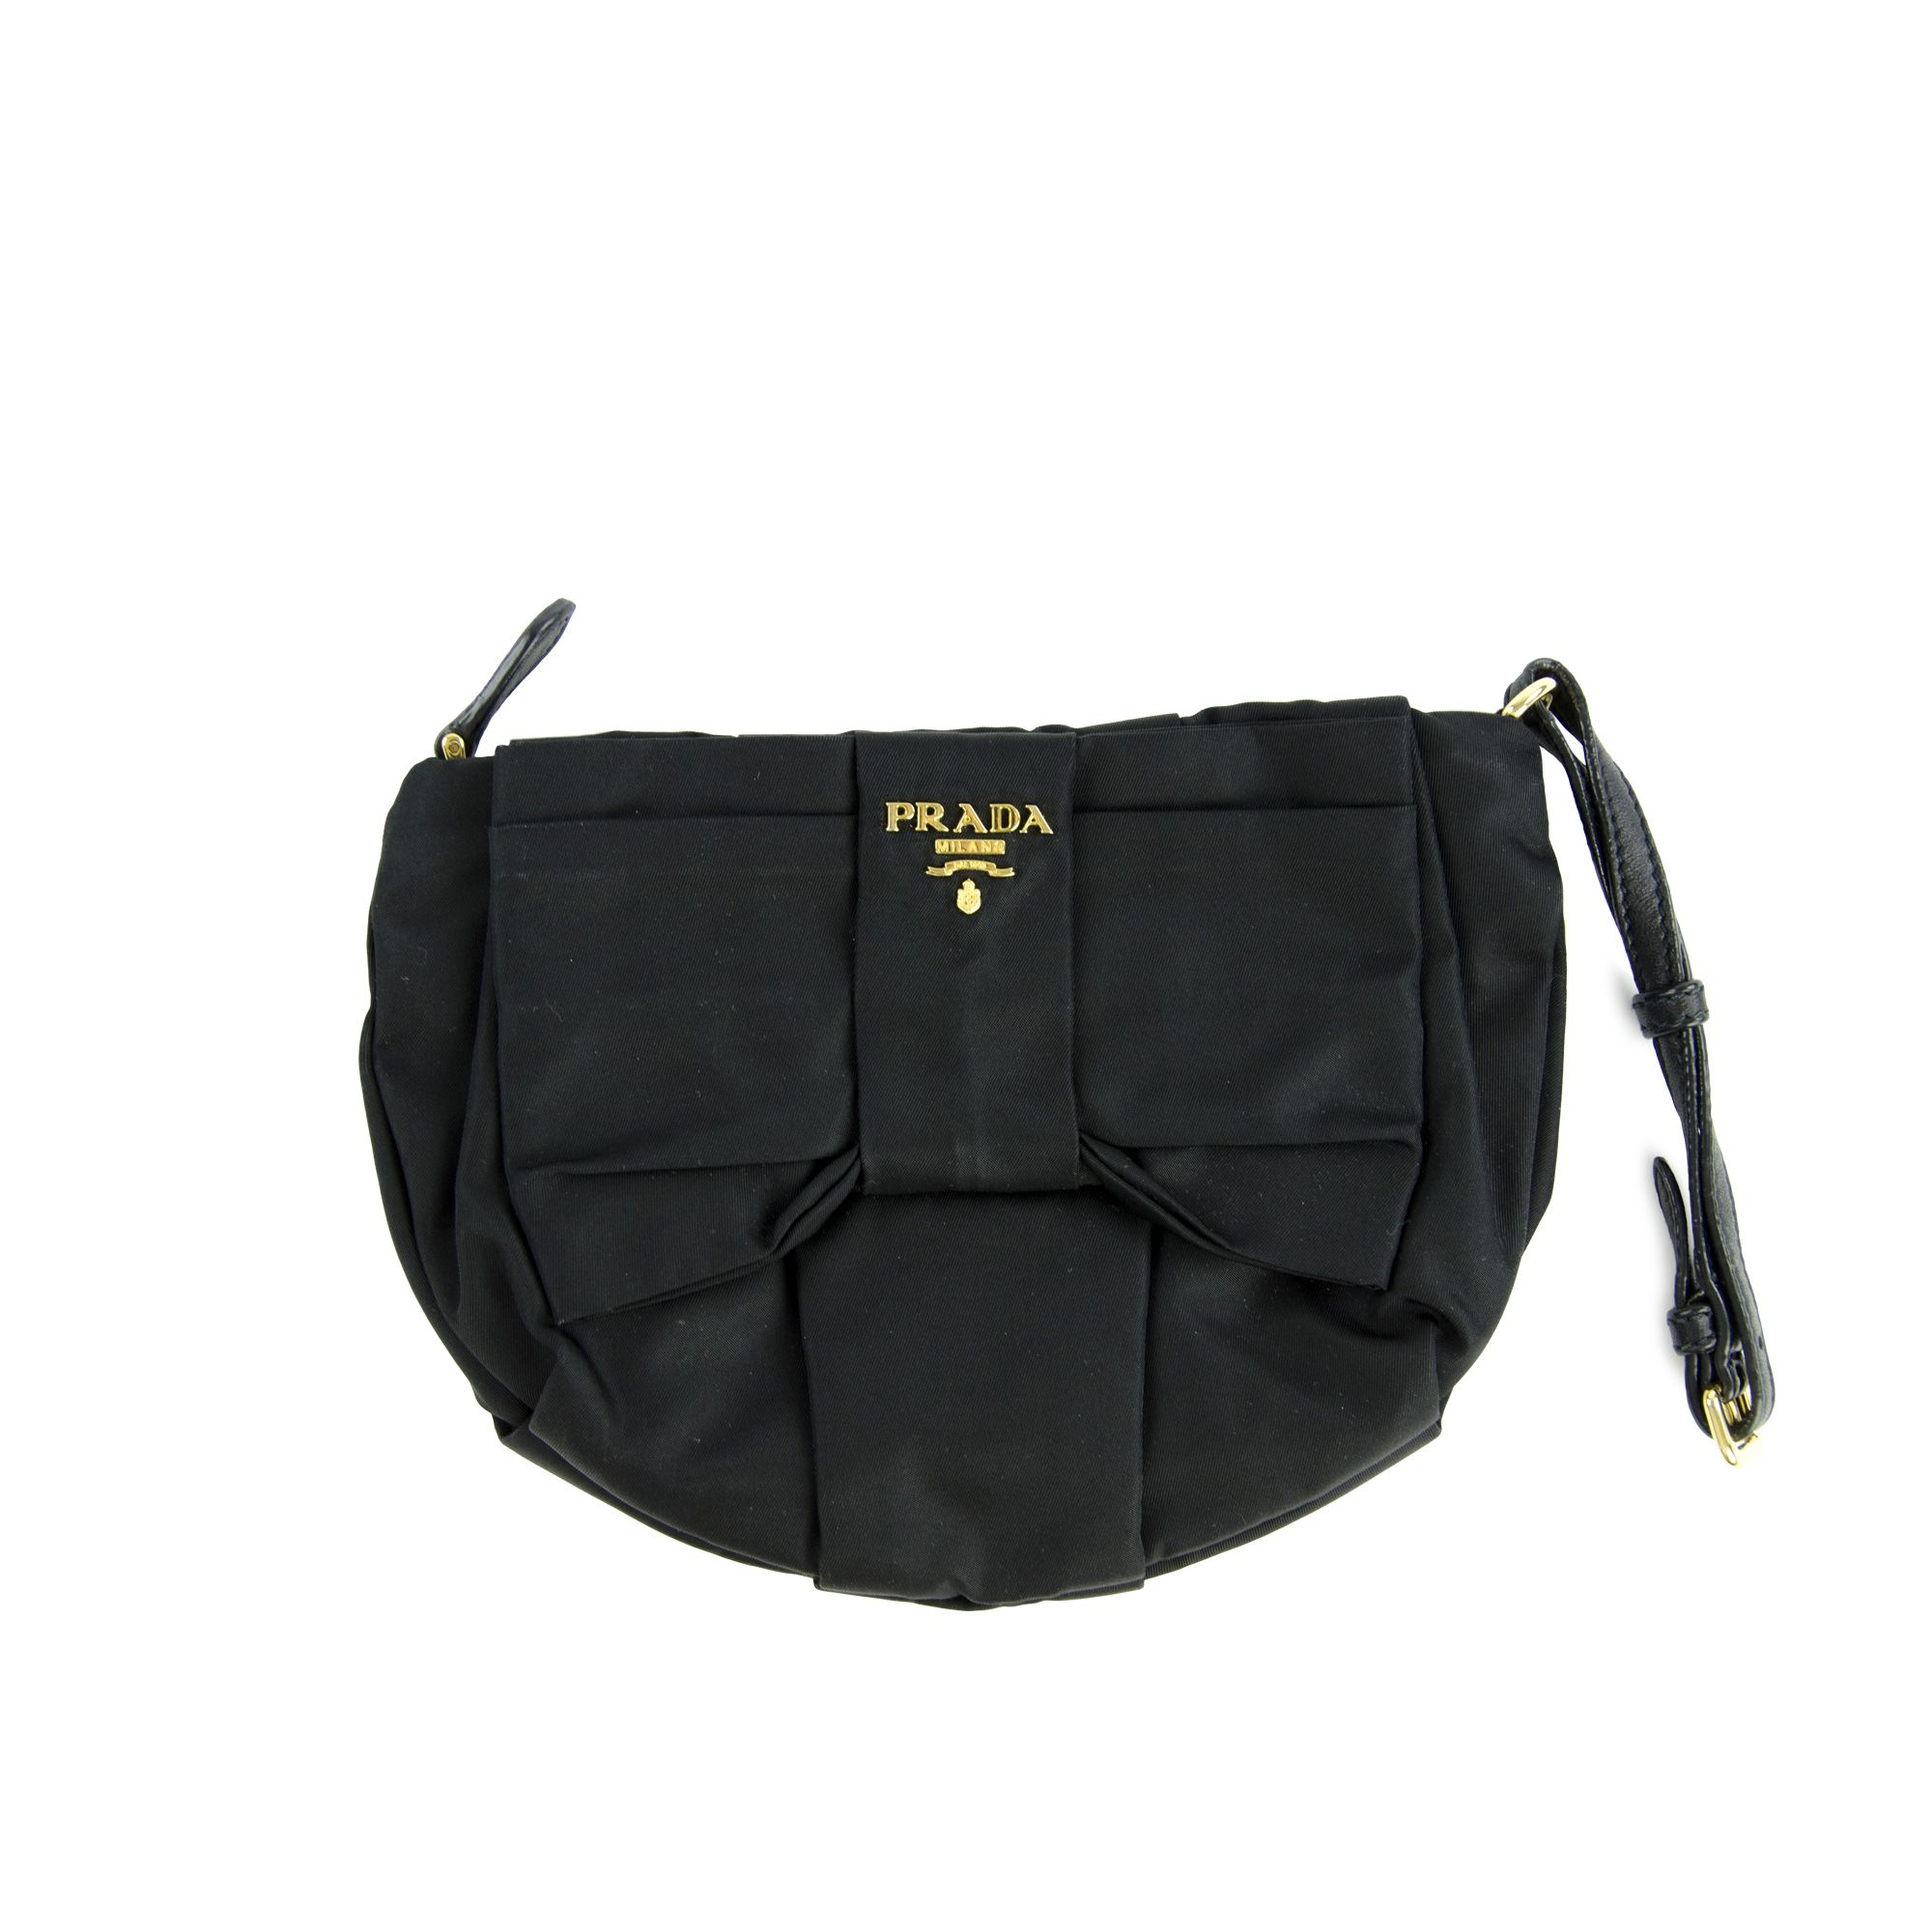 757a5ab84e ... low price prada tessuto wristlet bag with goldtone hardware salmon pink  jacquard lining buckled leather wrist